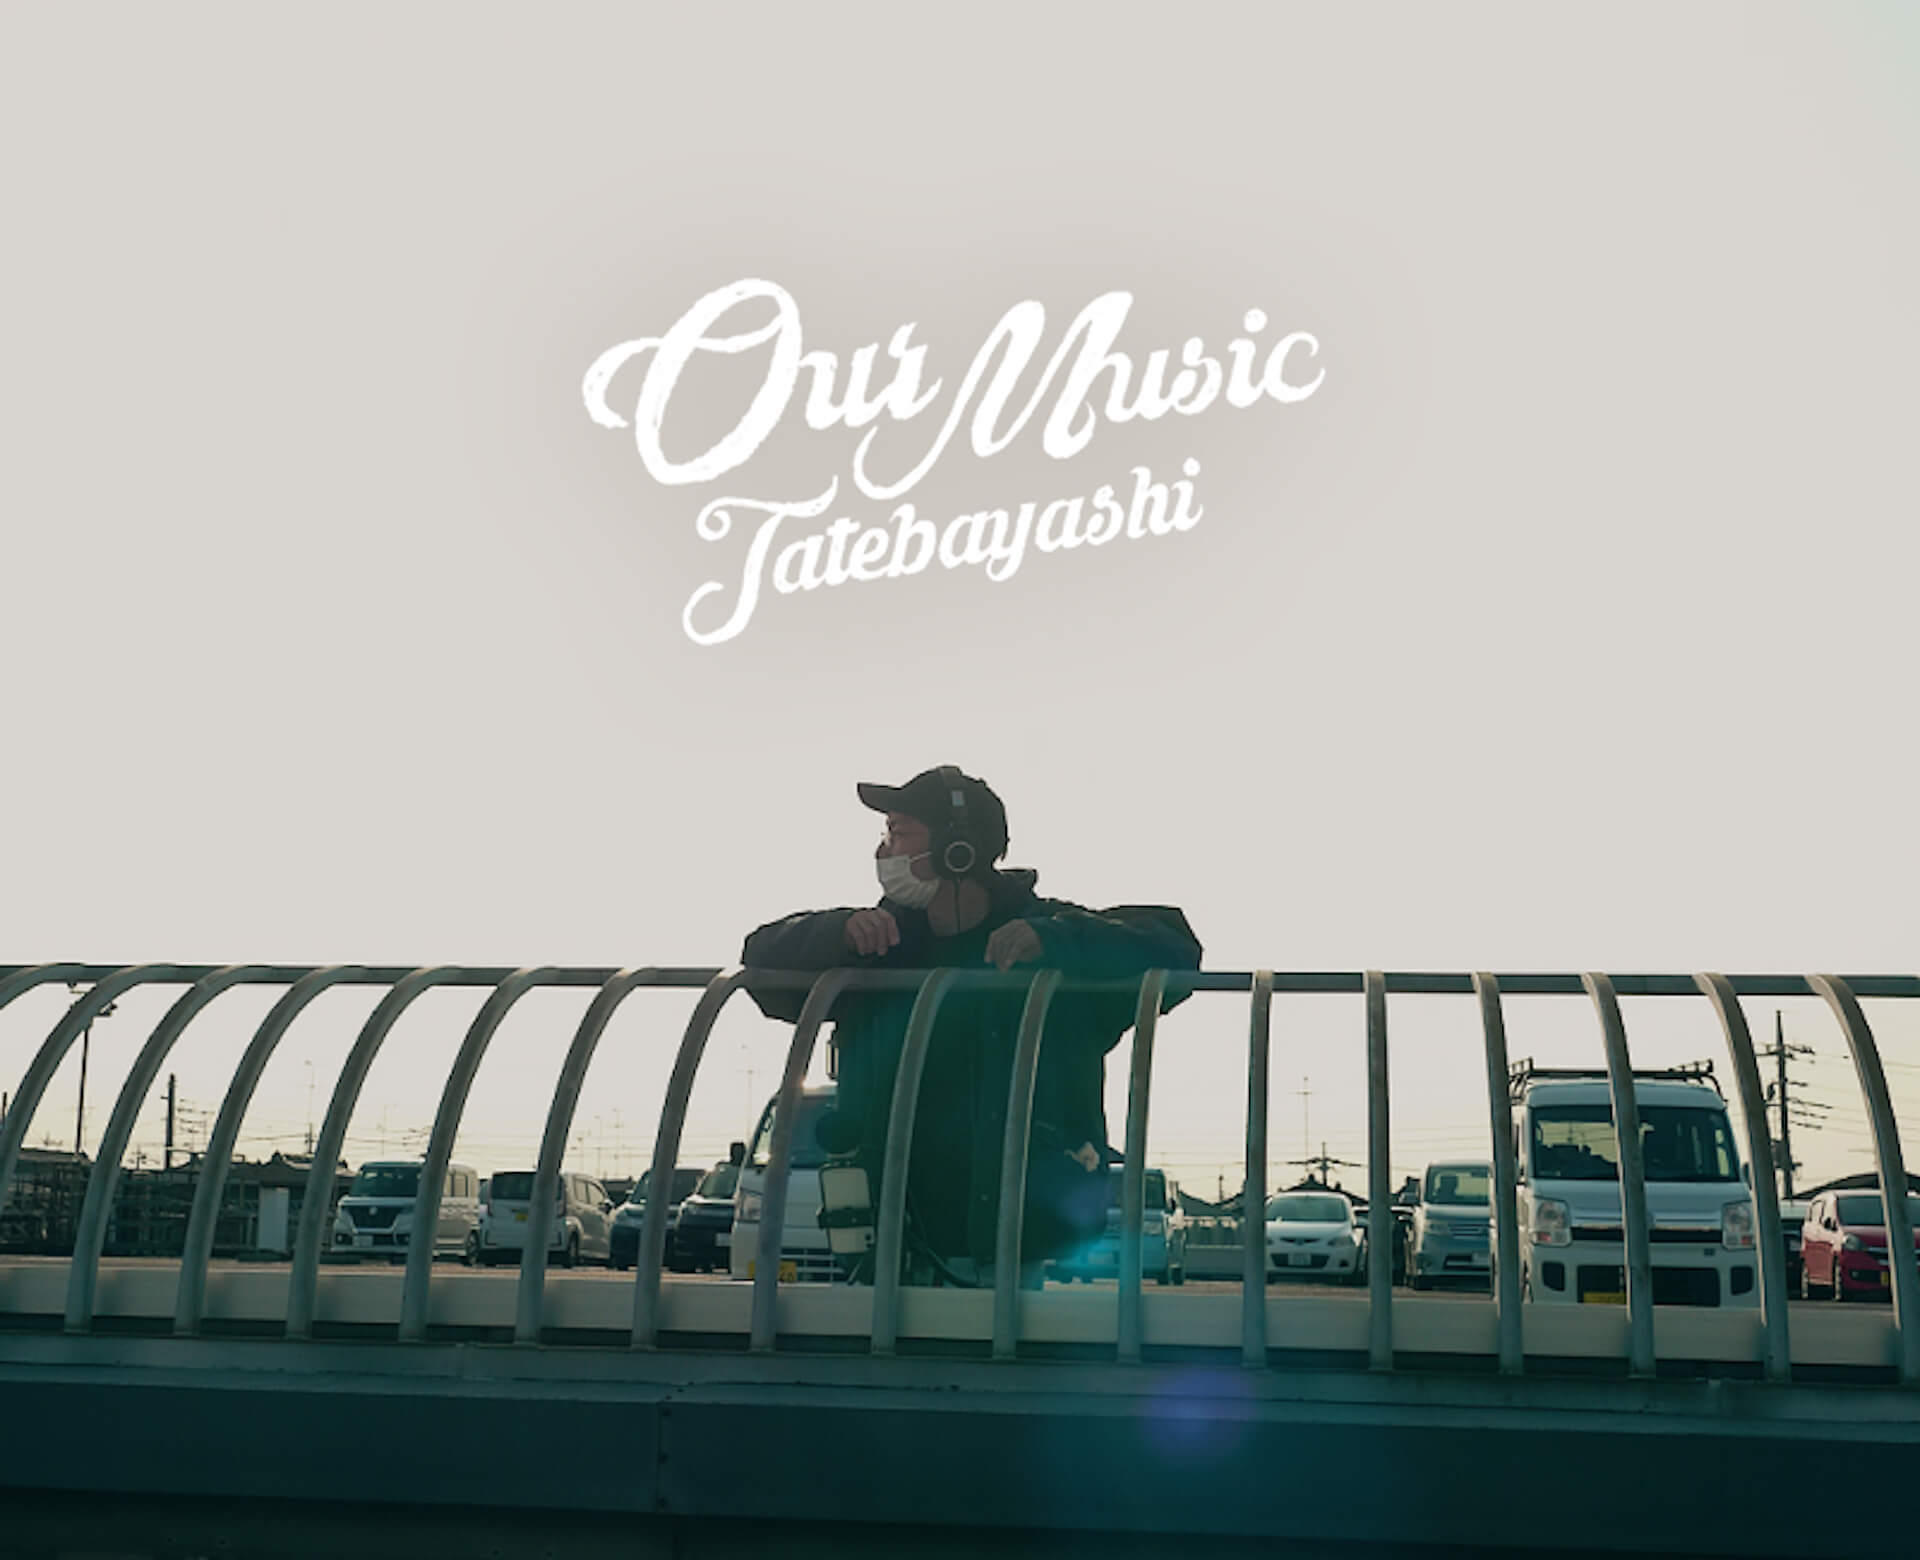 VIDEOTAPEMUSICと天野大地によるドキュメンタリーシリーズ『Our Music: Tatebayashi』がLINE NEWSにて配信開始!「試行錯誤の末に音楽を作った2020年春の記録」 music200515_ourmusic_1